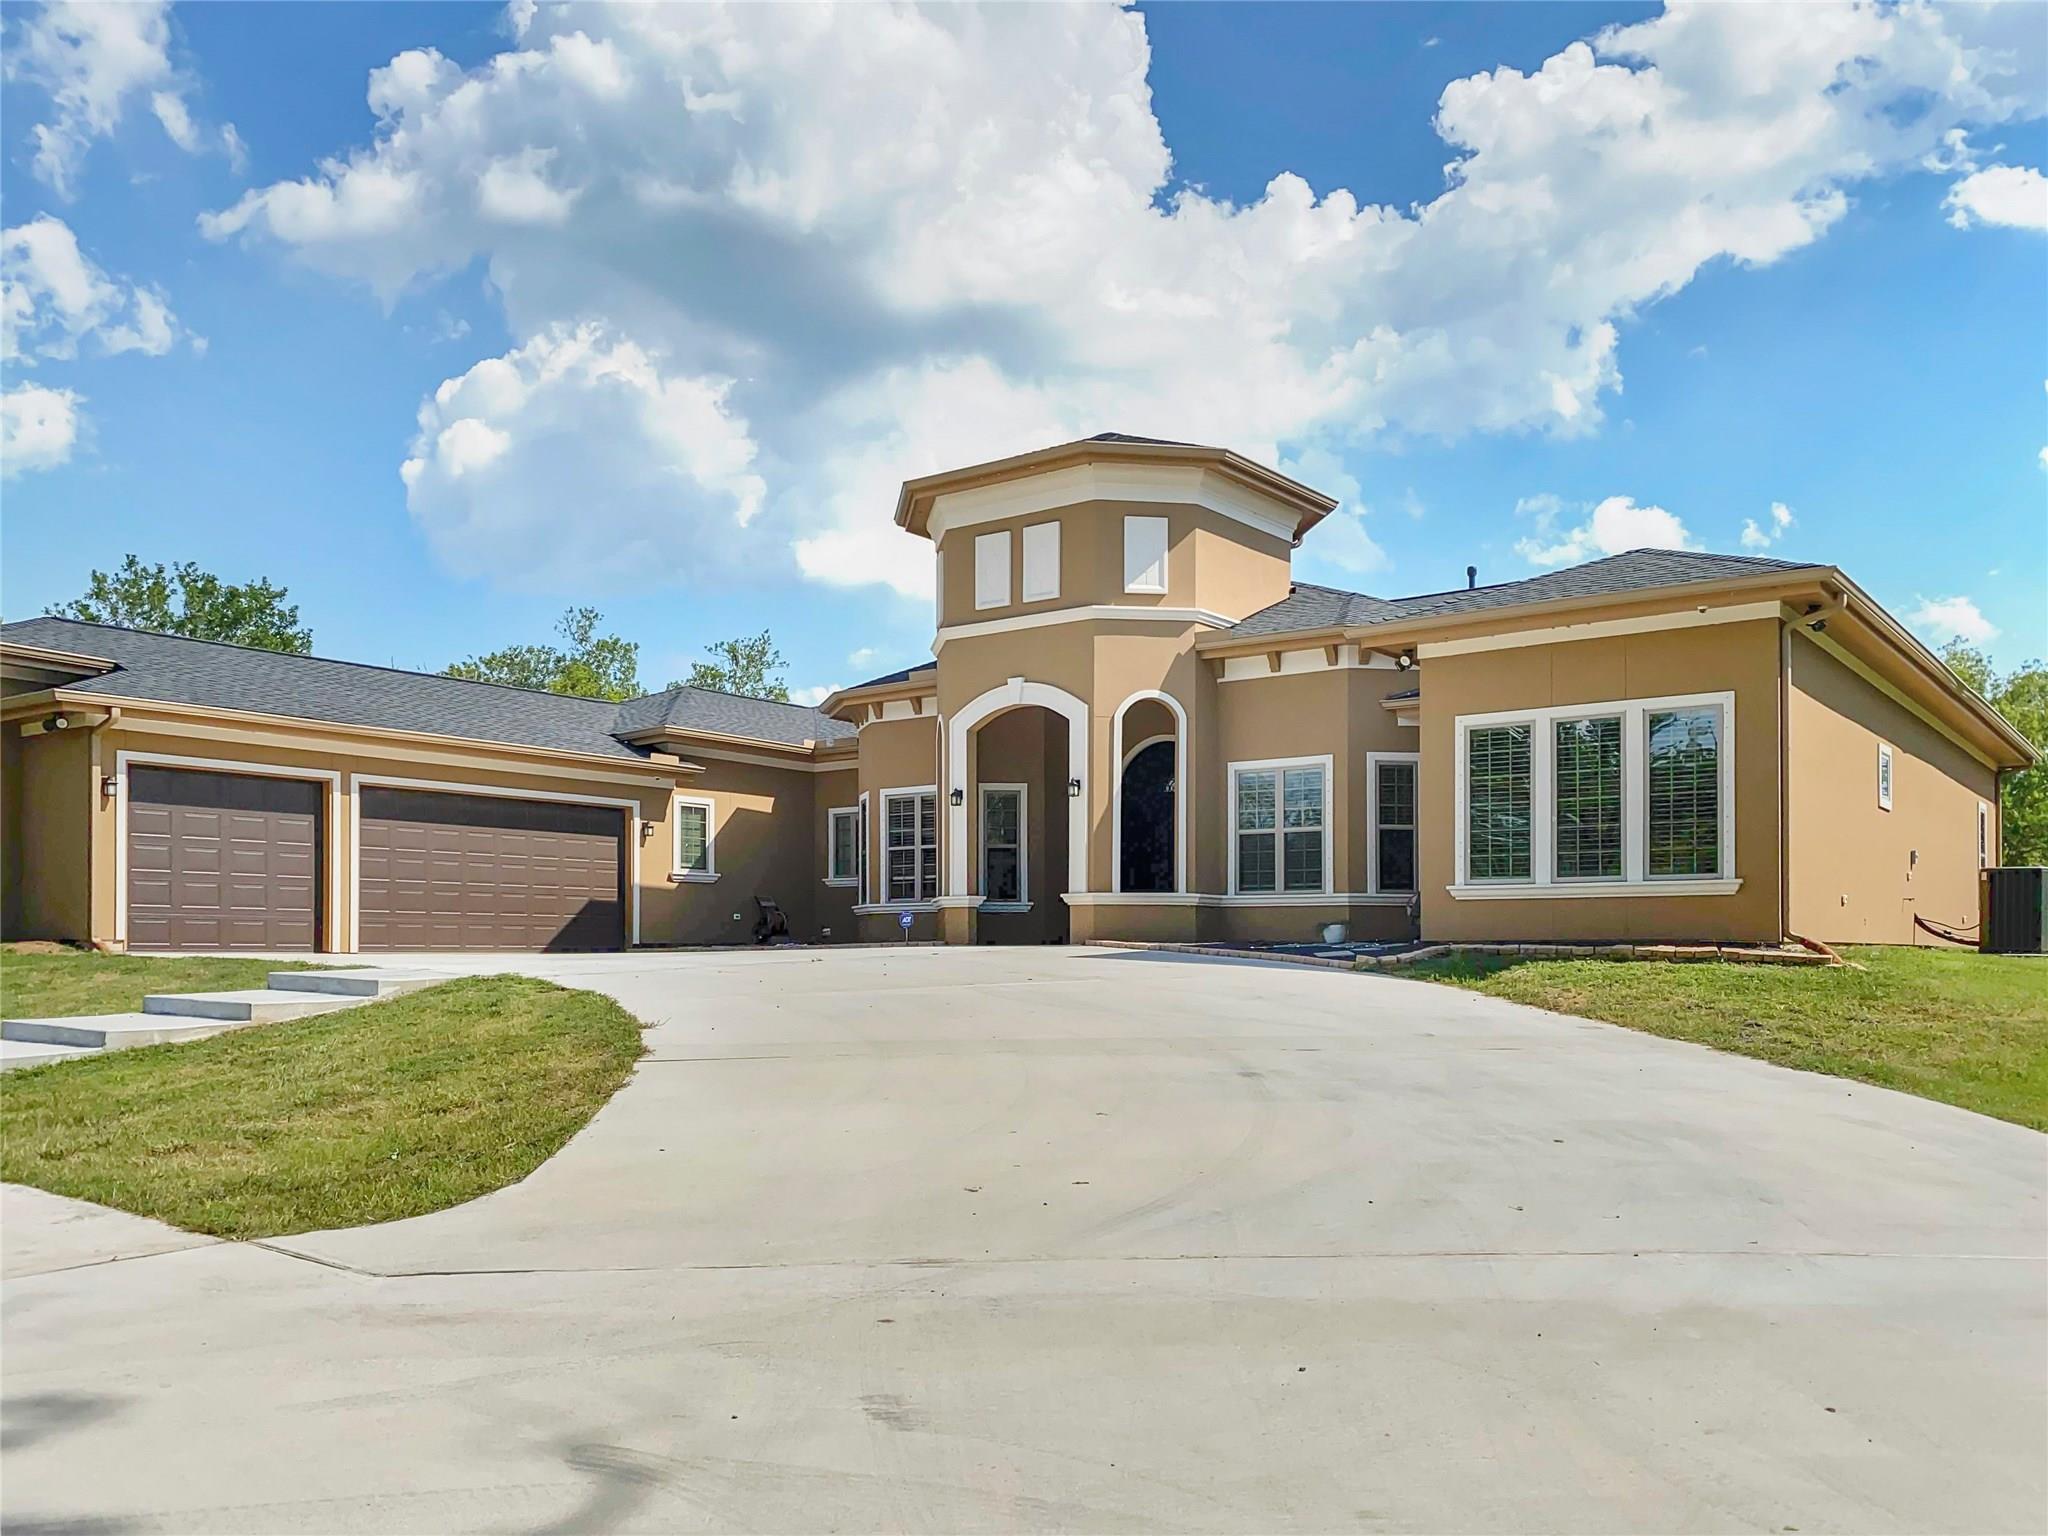 307 Rabbit Trail Property Photo - Lake Jackson, TX real estate listing